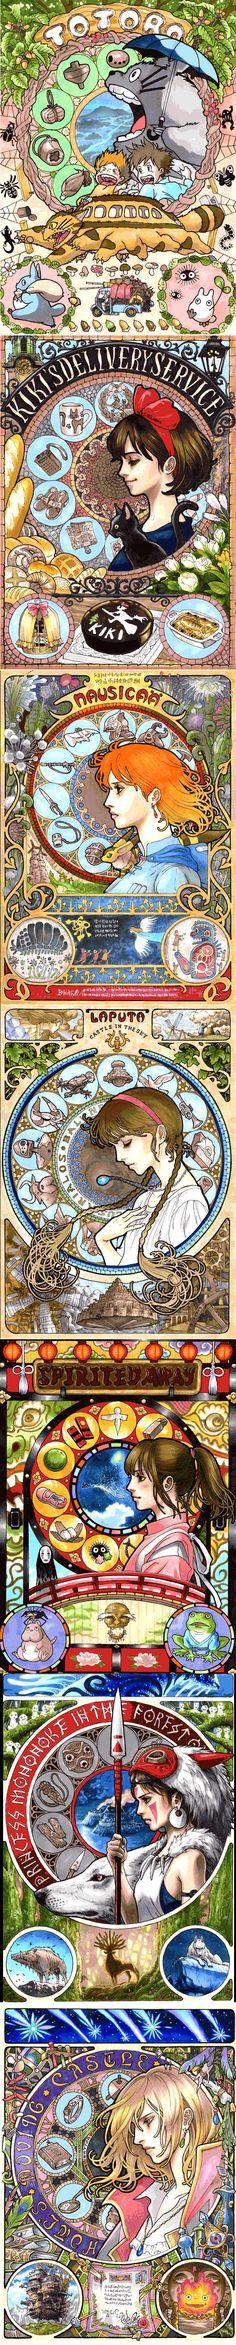 Art nouveau-inspired portraits of Miyazaki's characters (610x6062)